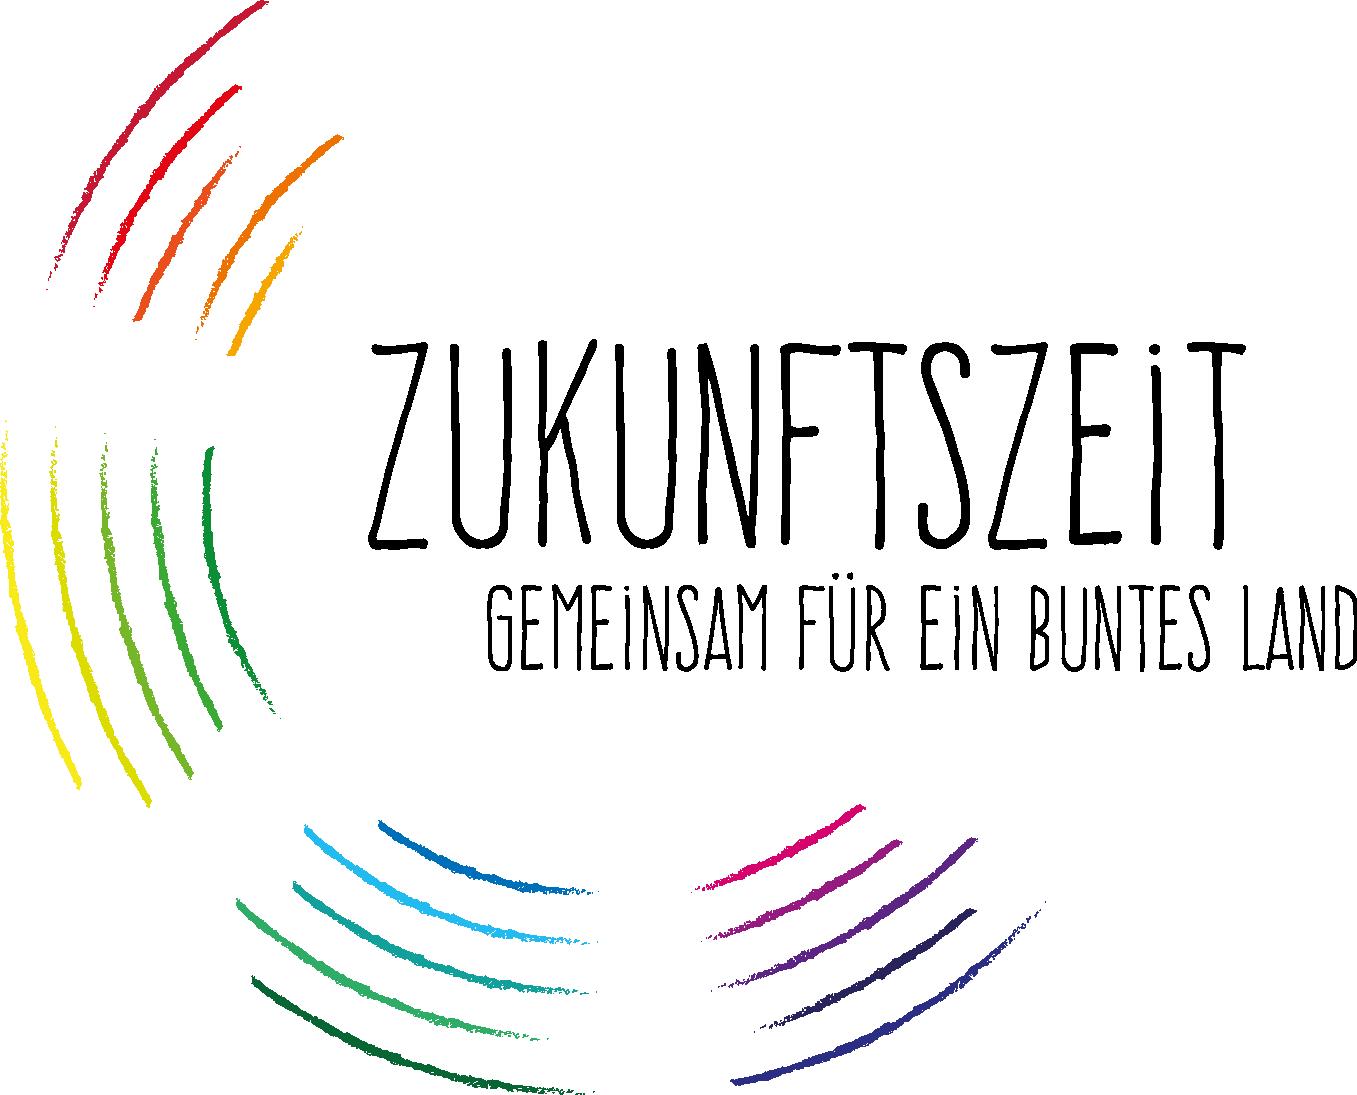 zukunftszeit_Logo